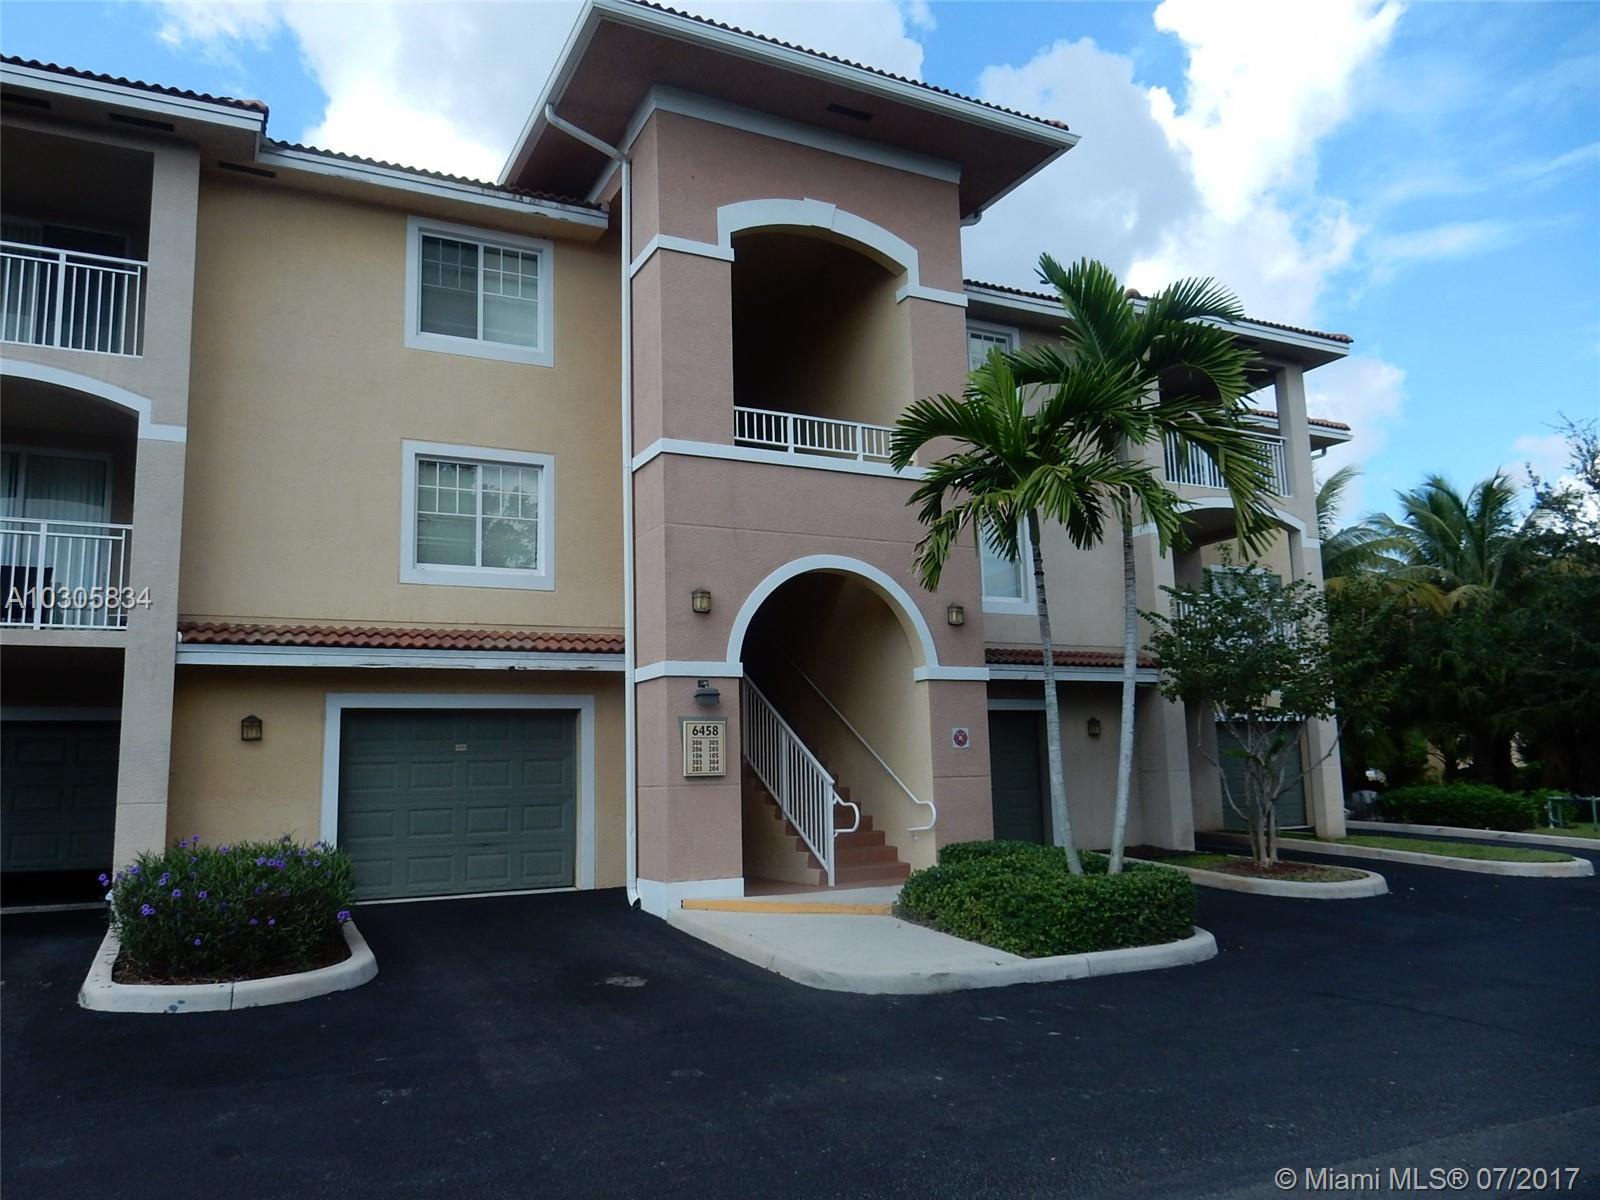 6458 Emerald Dunes Dr # 206, West Palm Beach, FL 33411